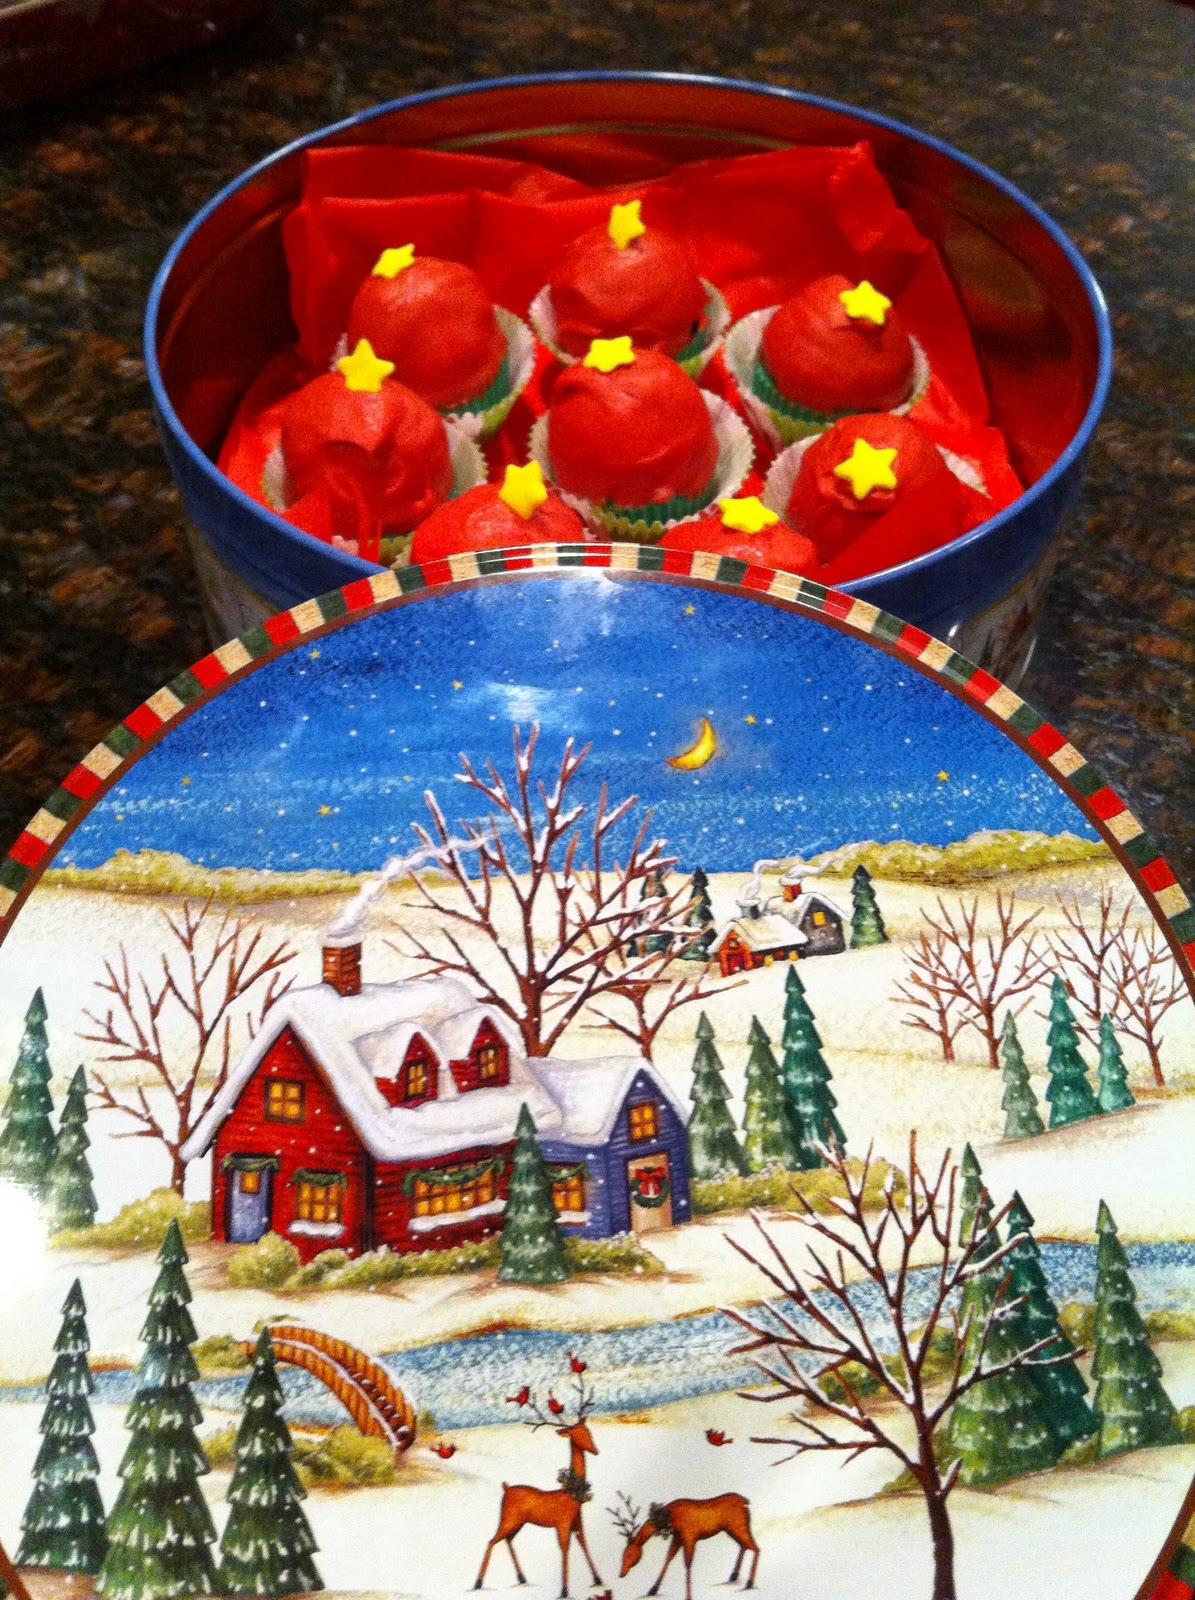 A Christmas Hostess Gift - My Sweet Zepol